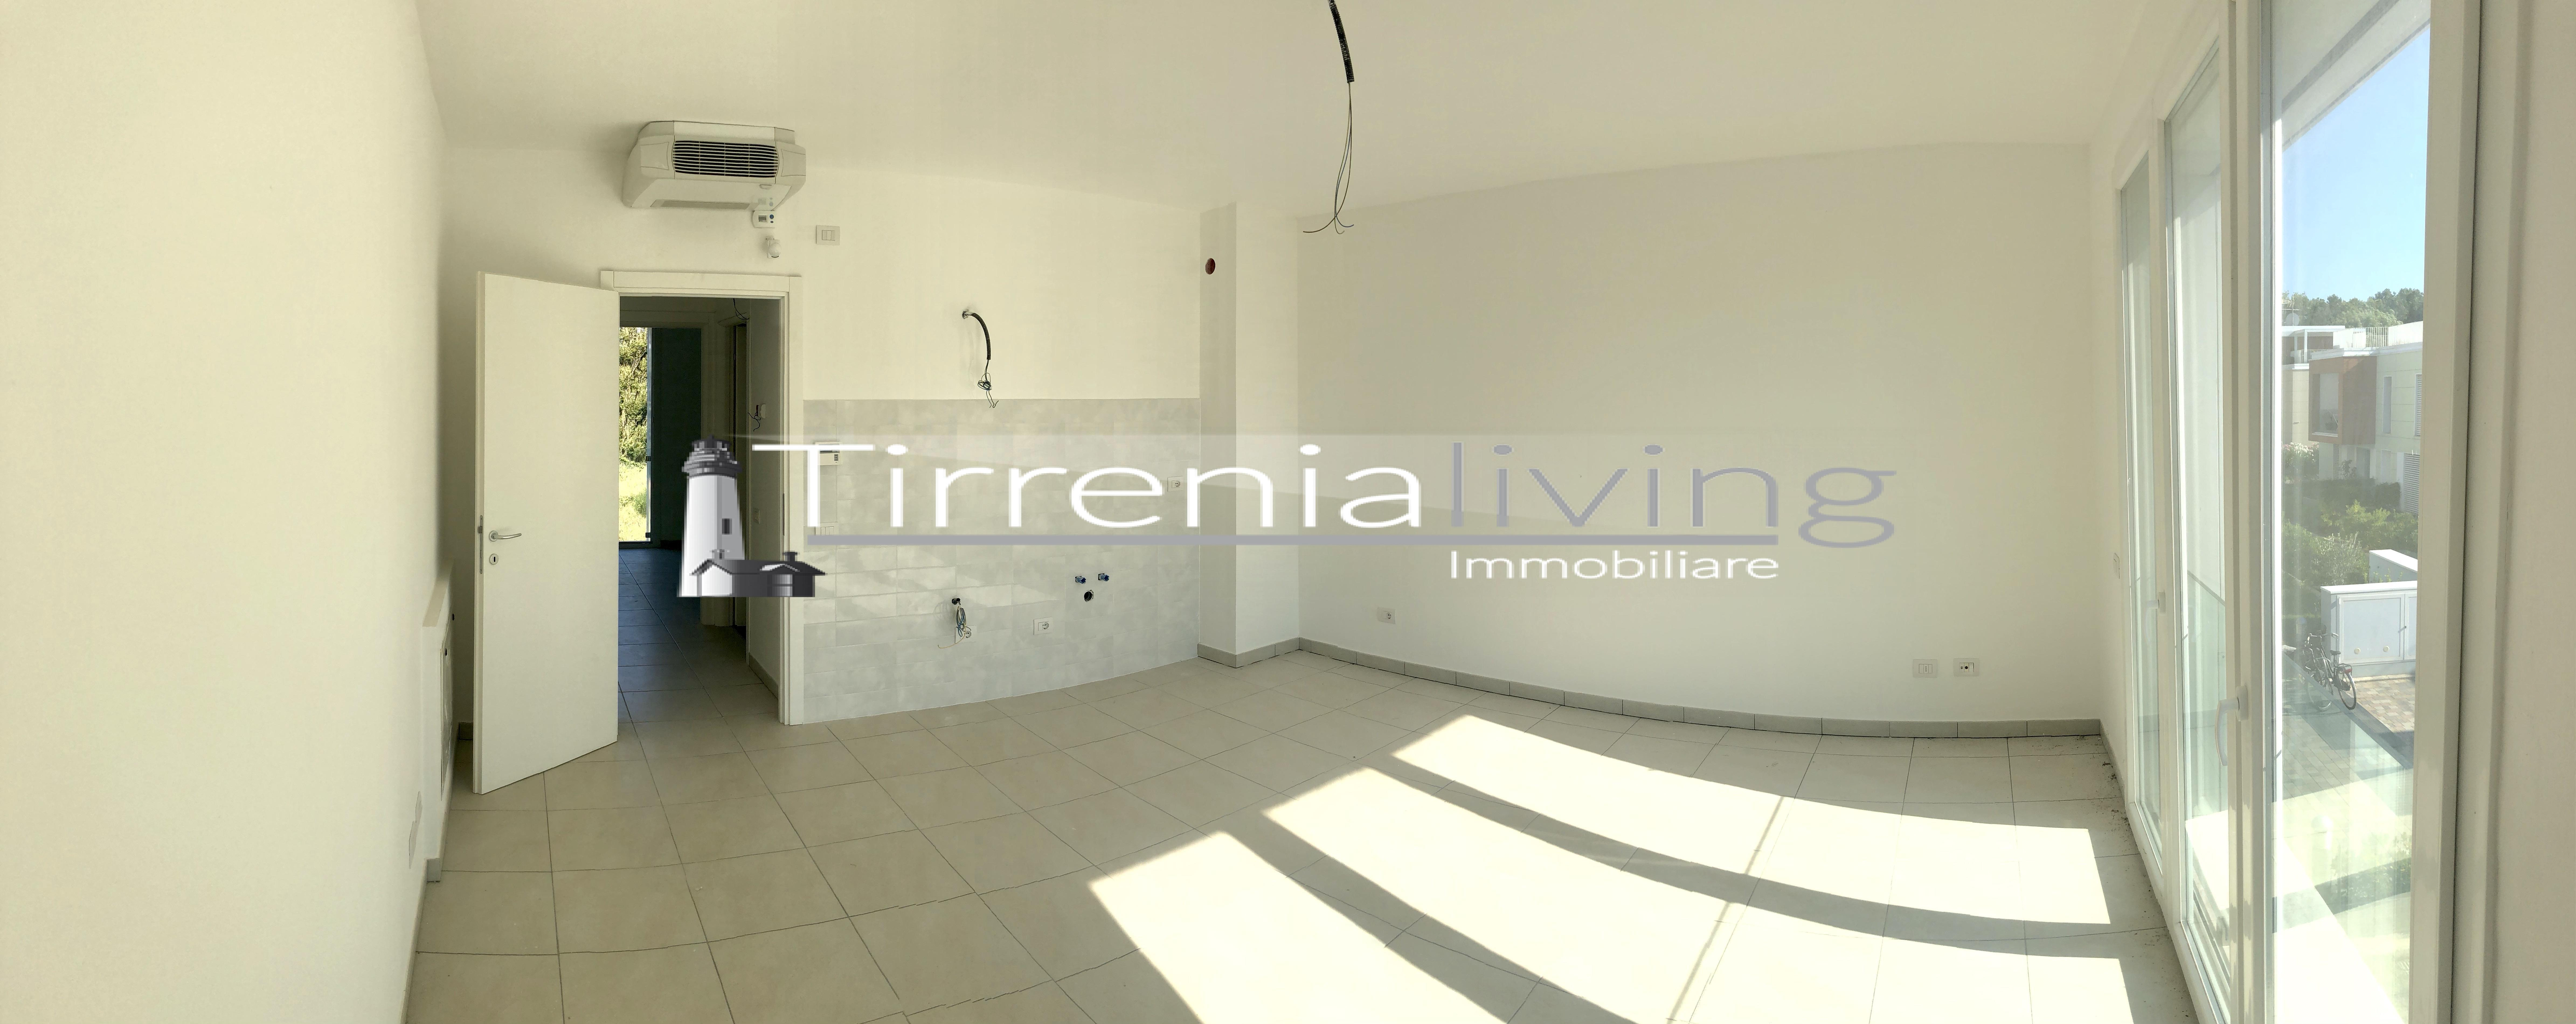 Apartment for sale in Pisa